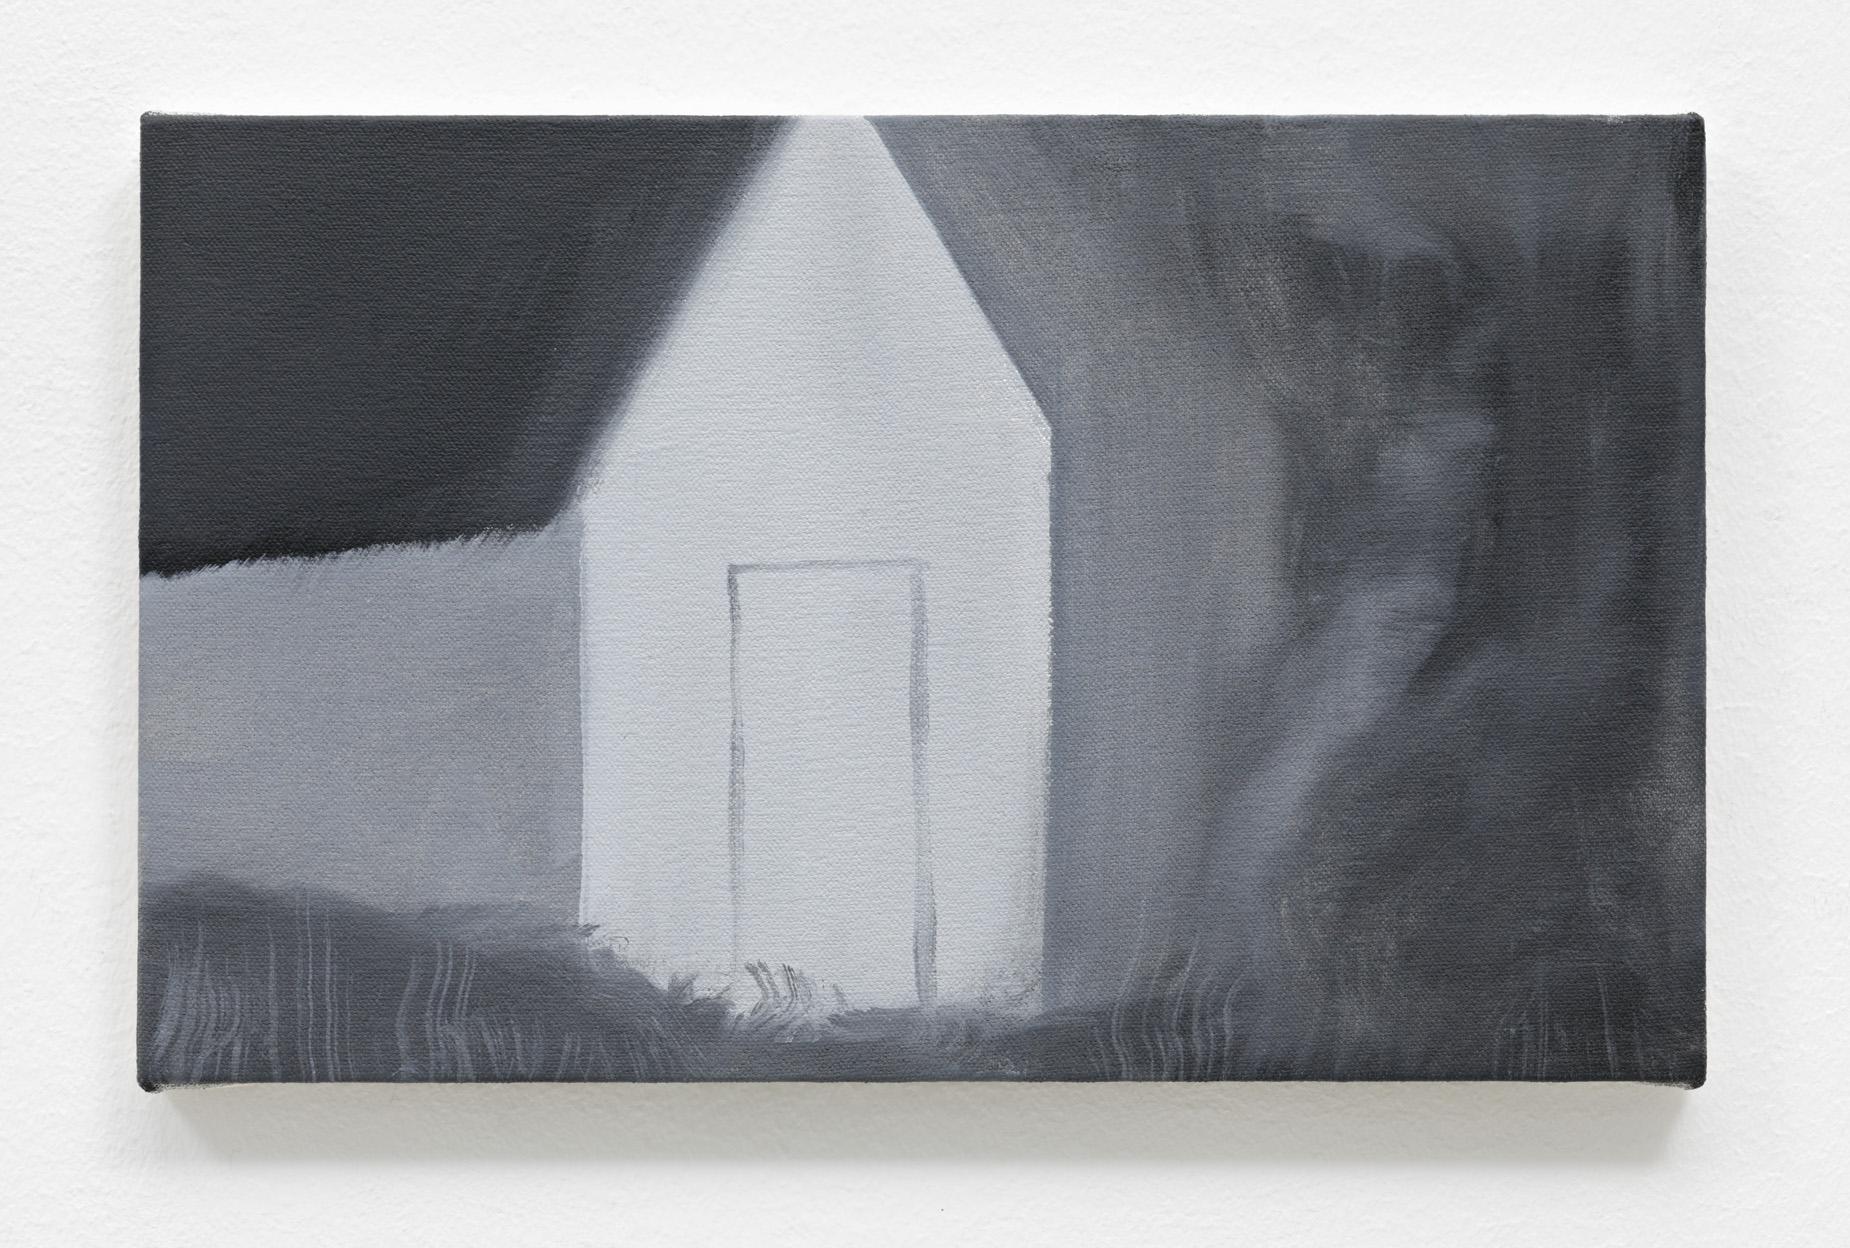 Stephen Aldahl